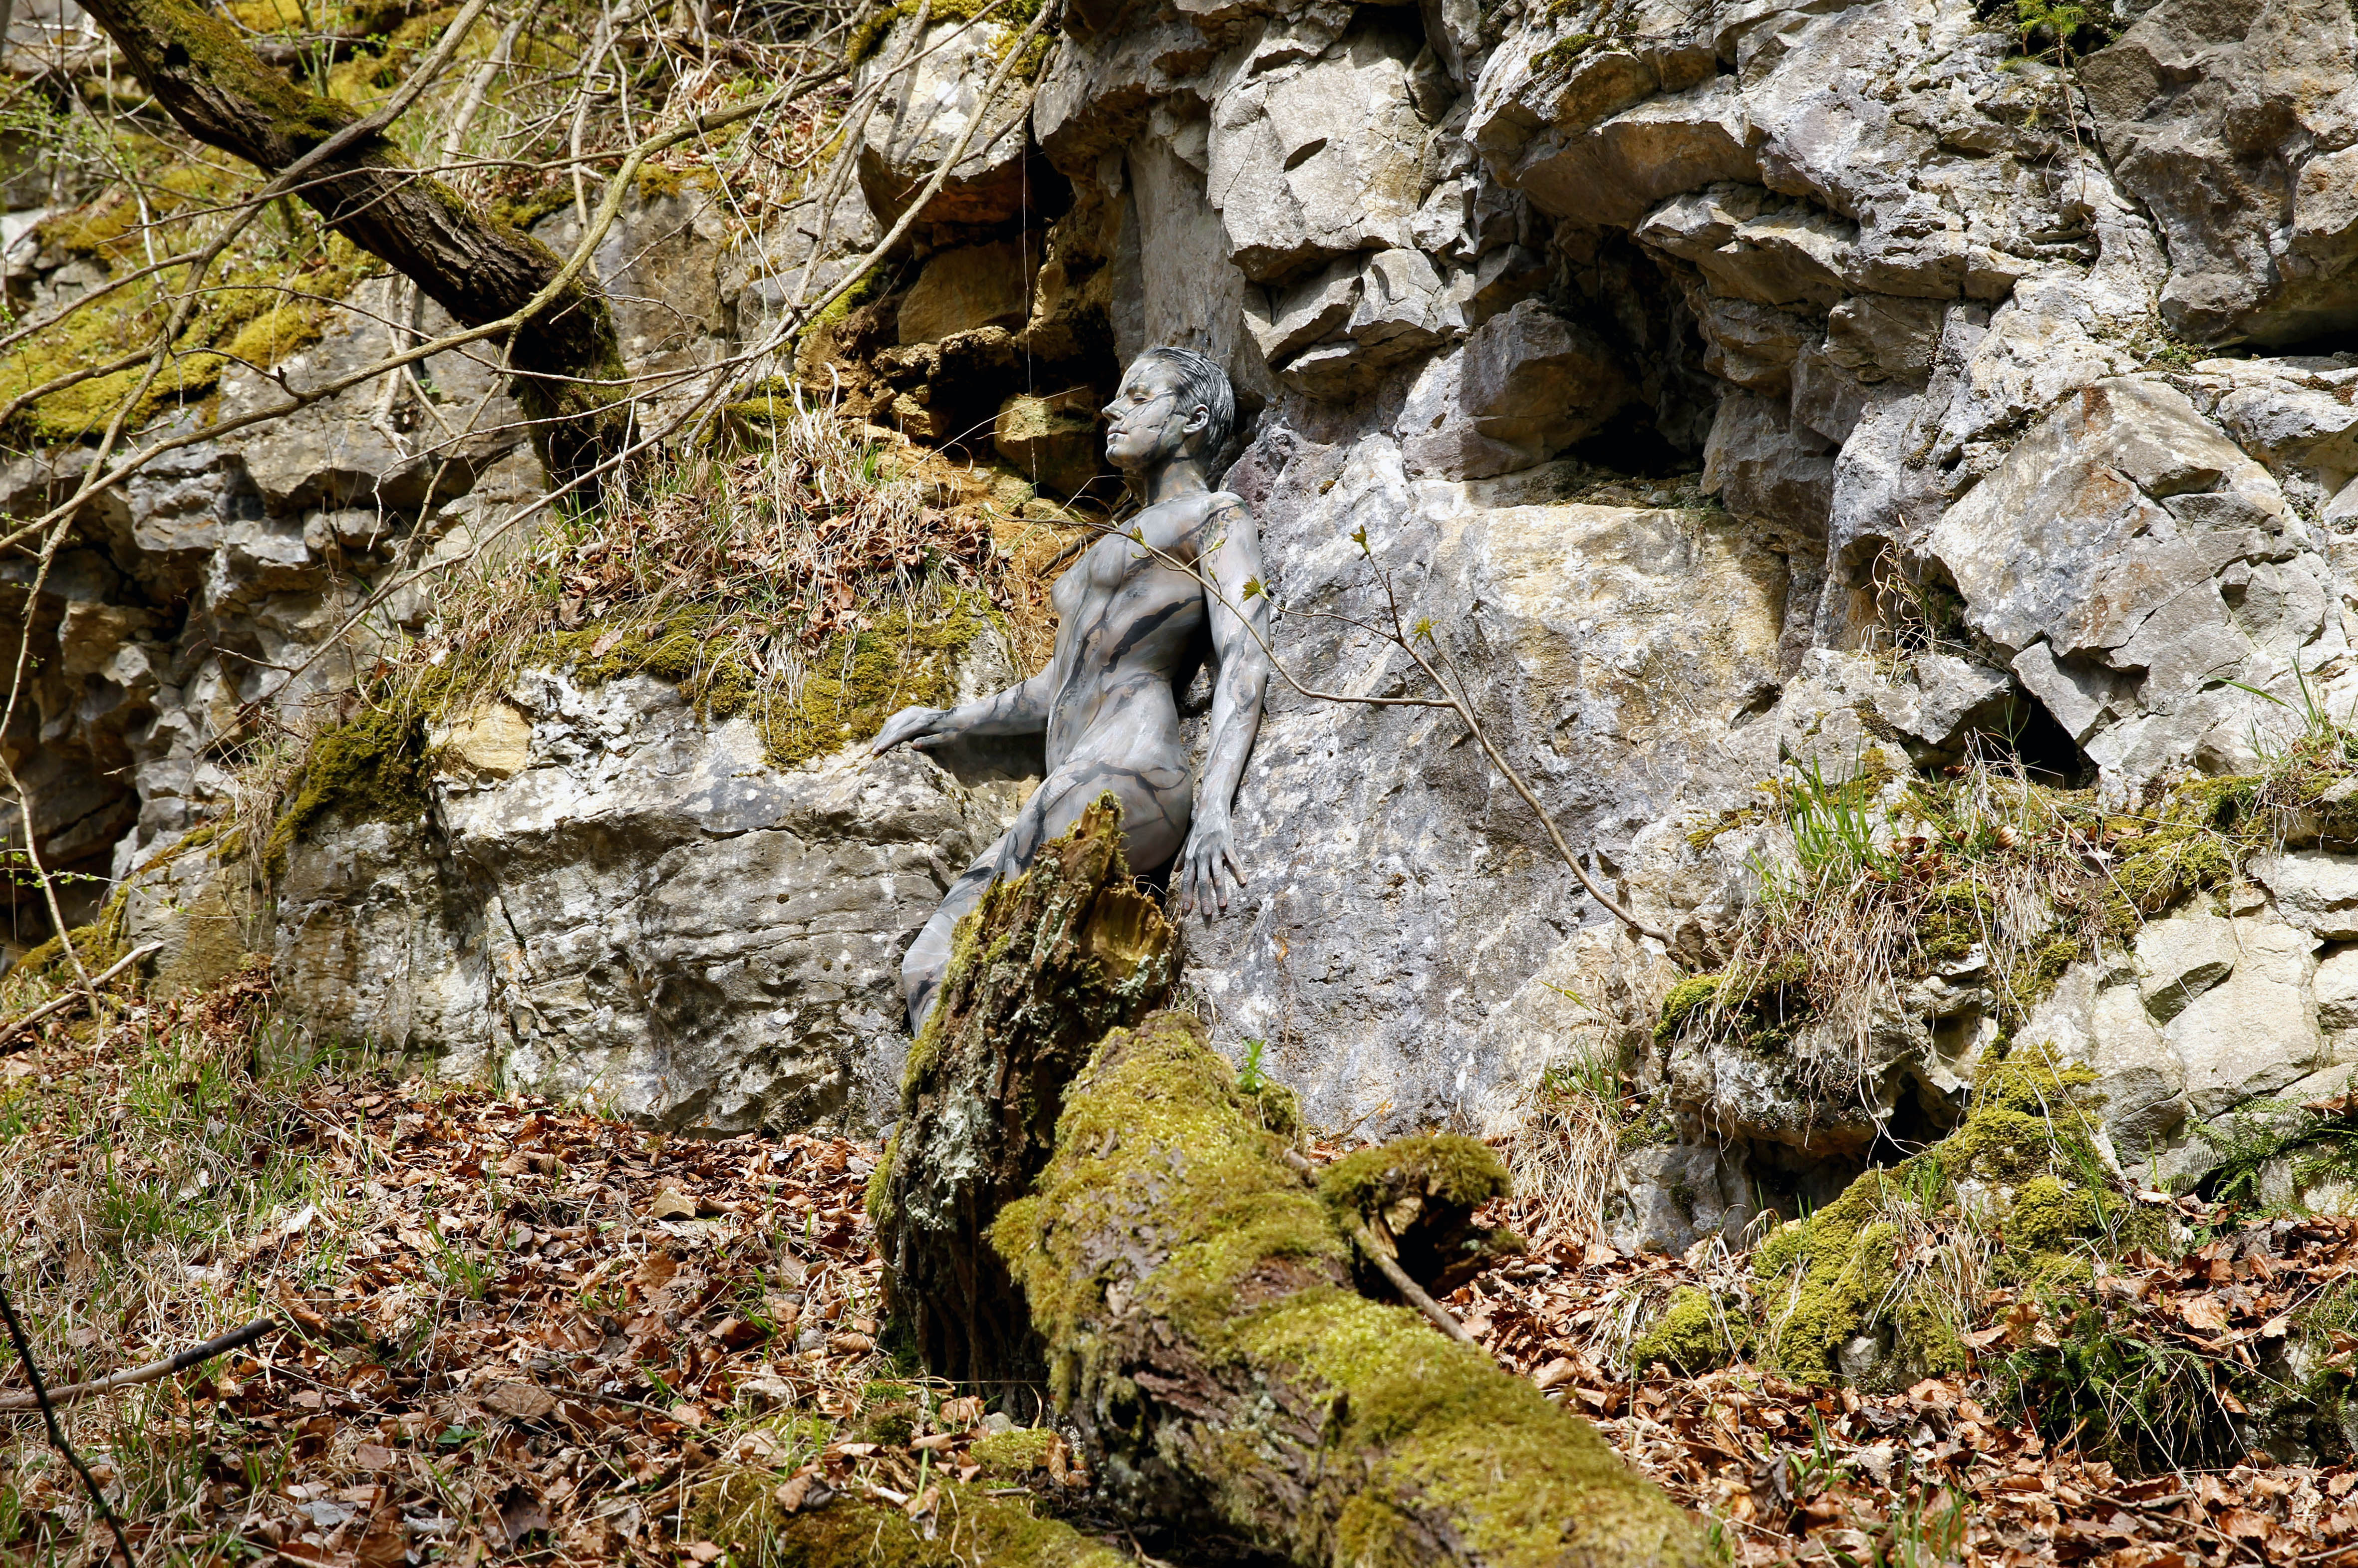 German body-painting artist Joerg Duesterwald's 'Rock Face'